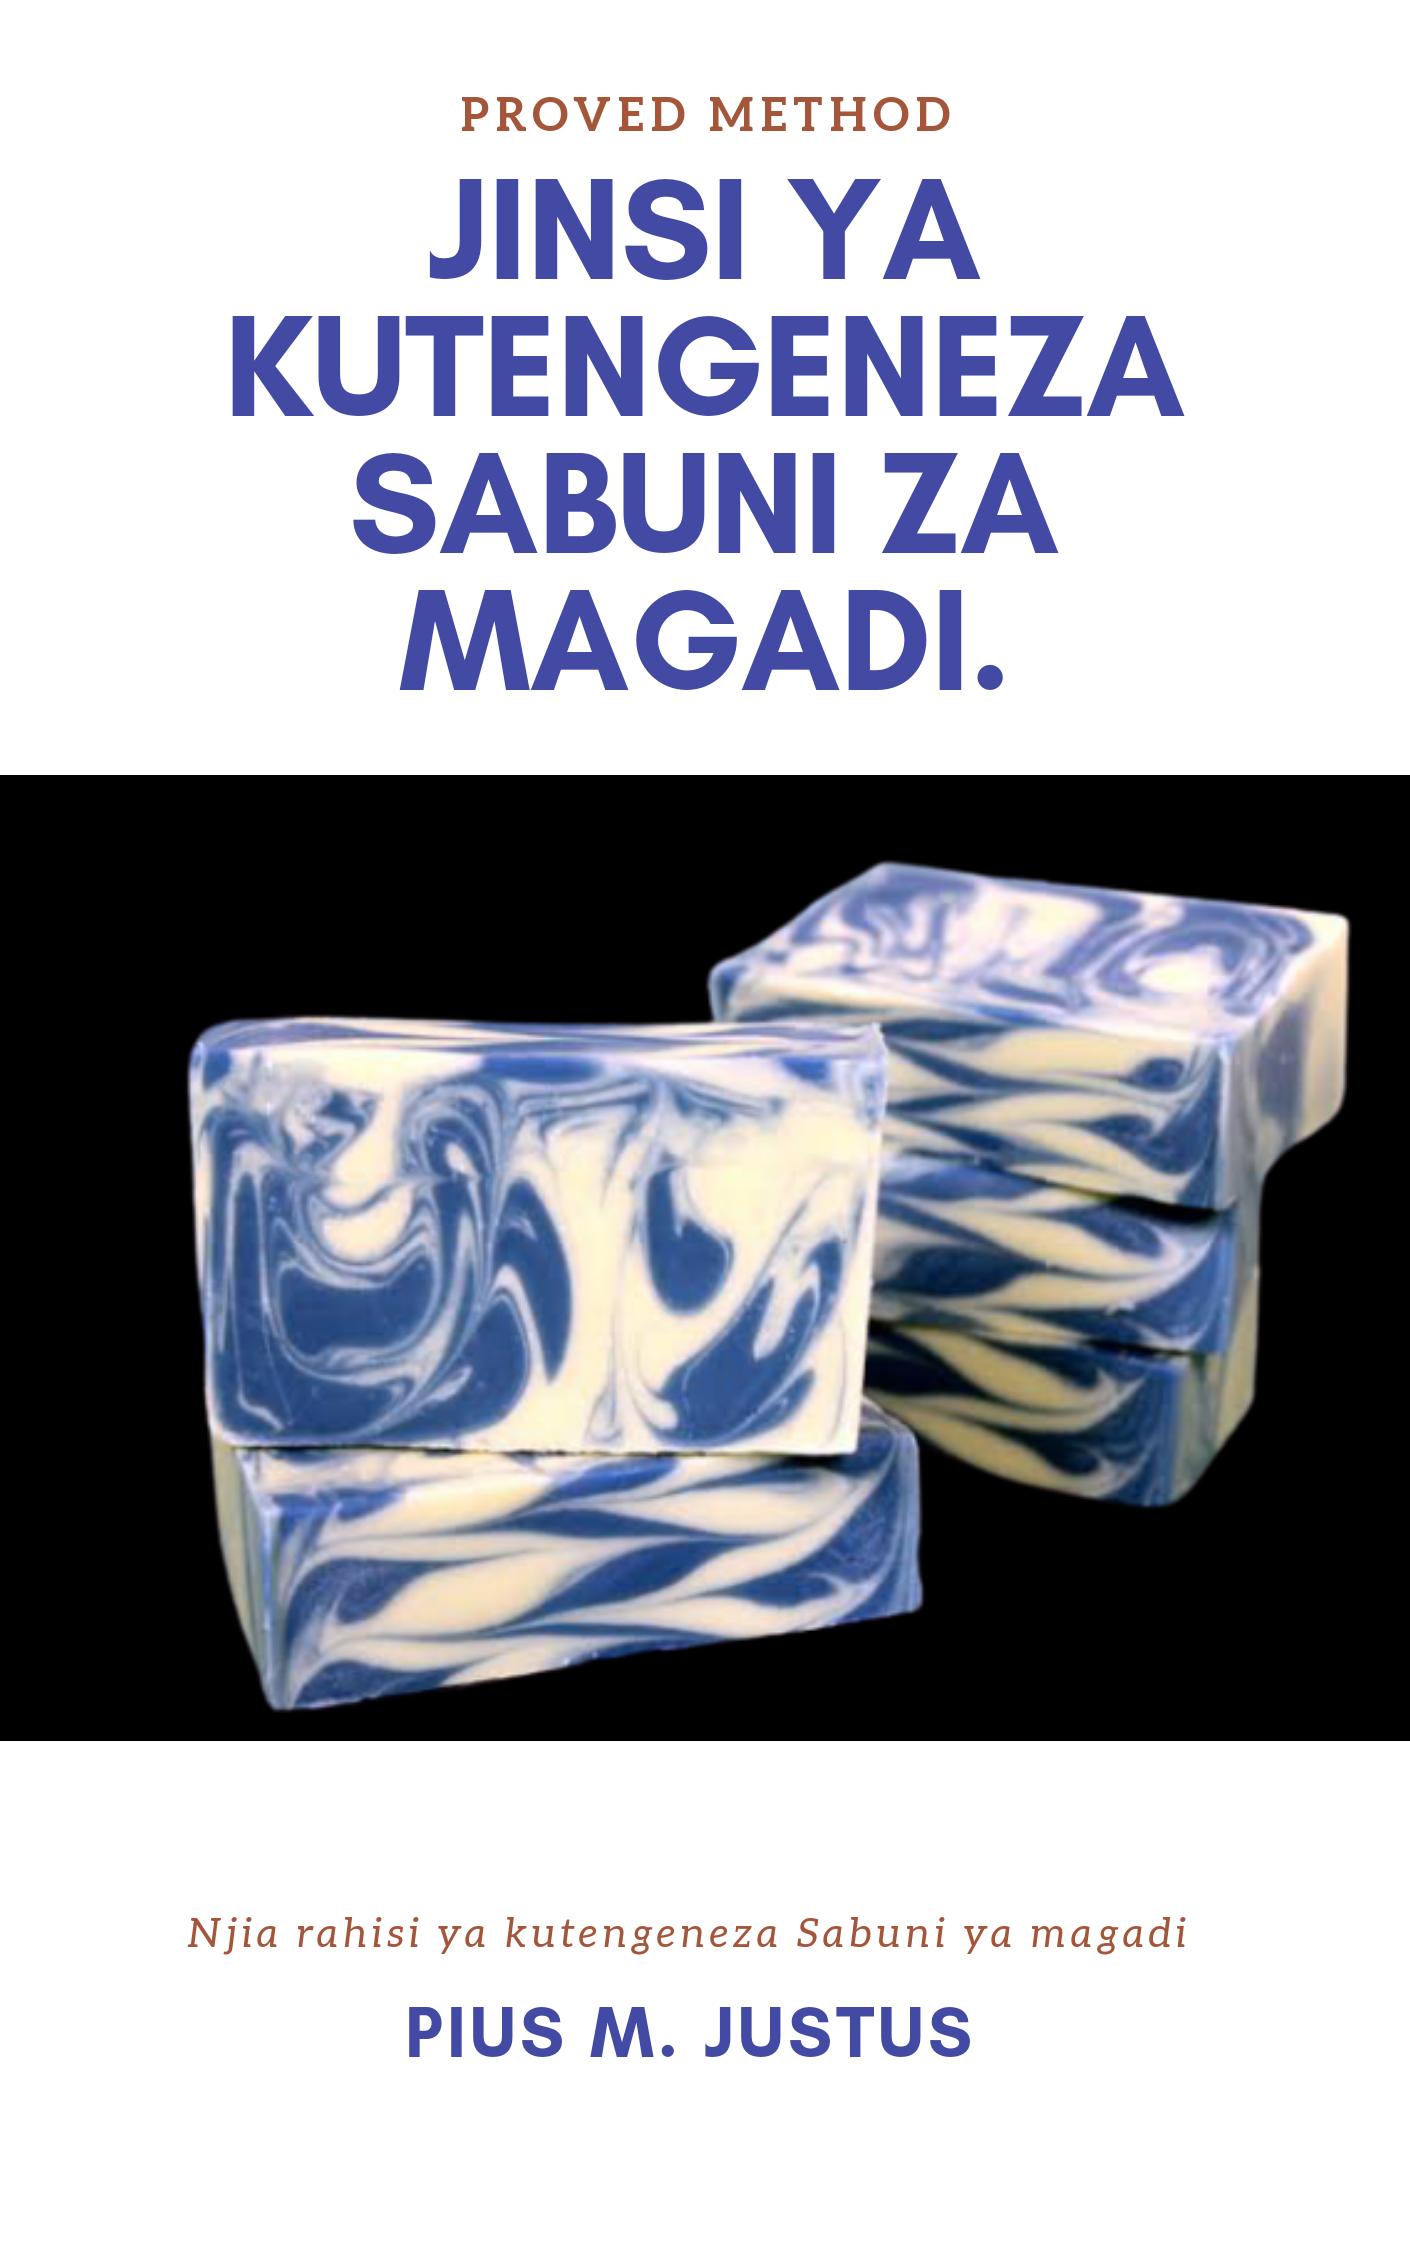 SABUNI ZA MAGADI